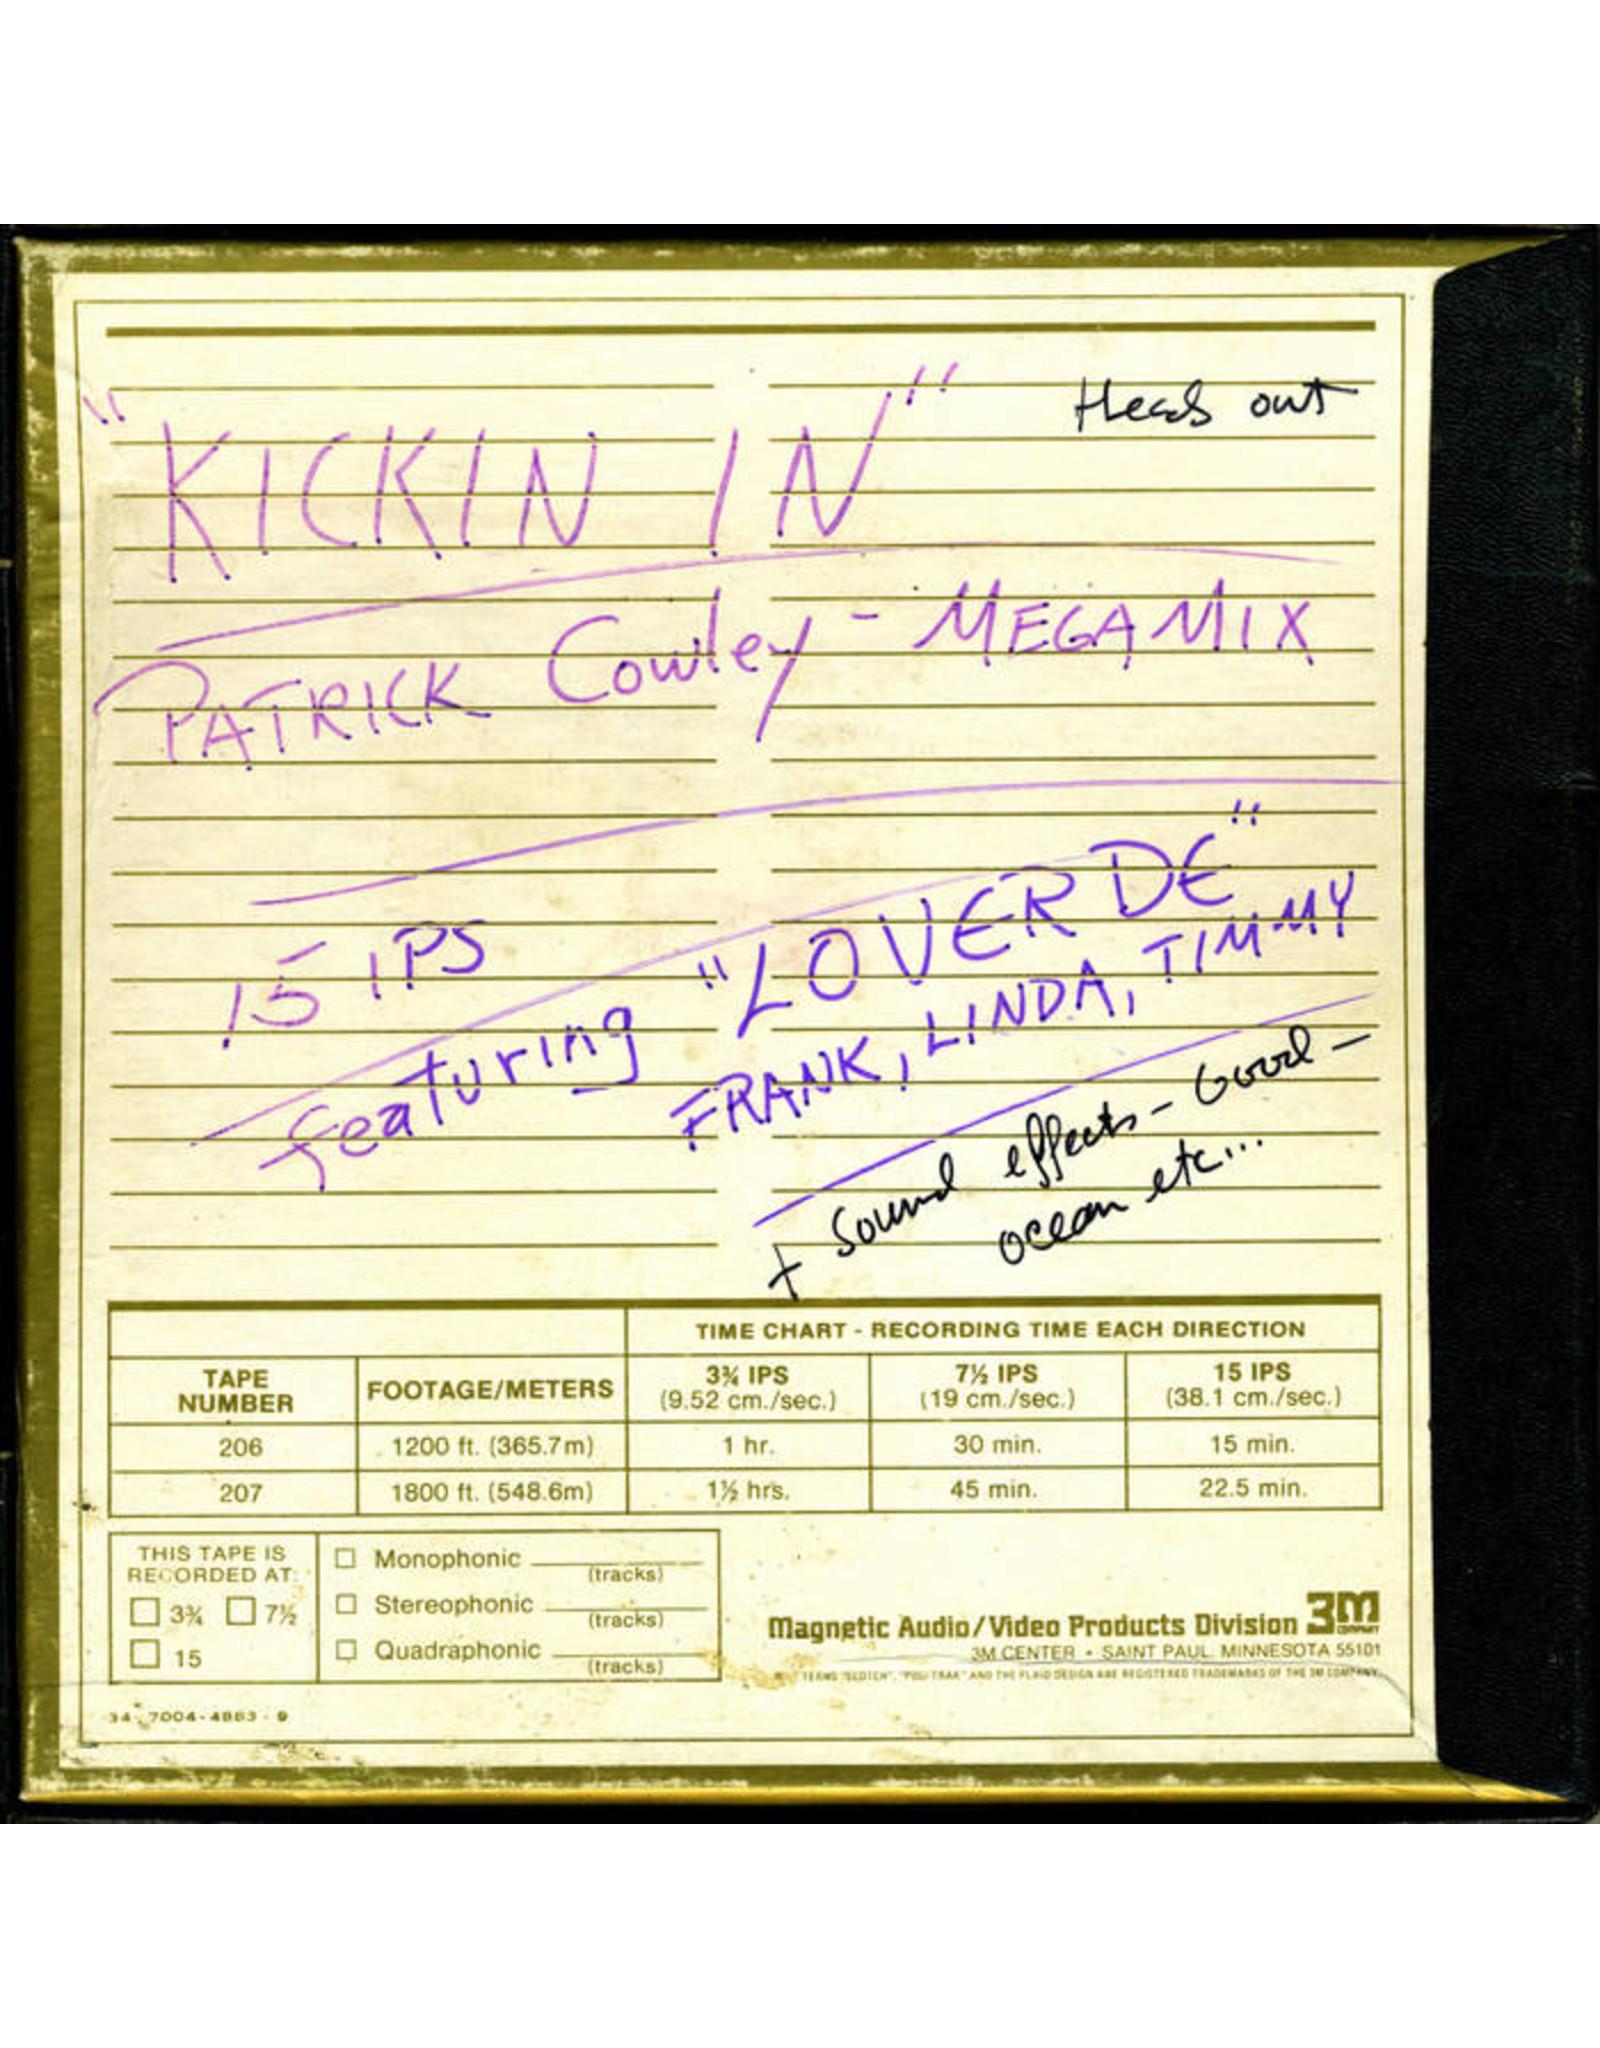 "New Vinyl Patrick Cowley - Kickin' It 12"""